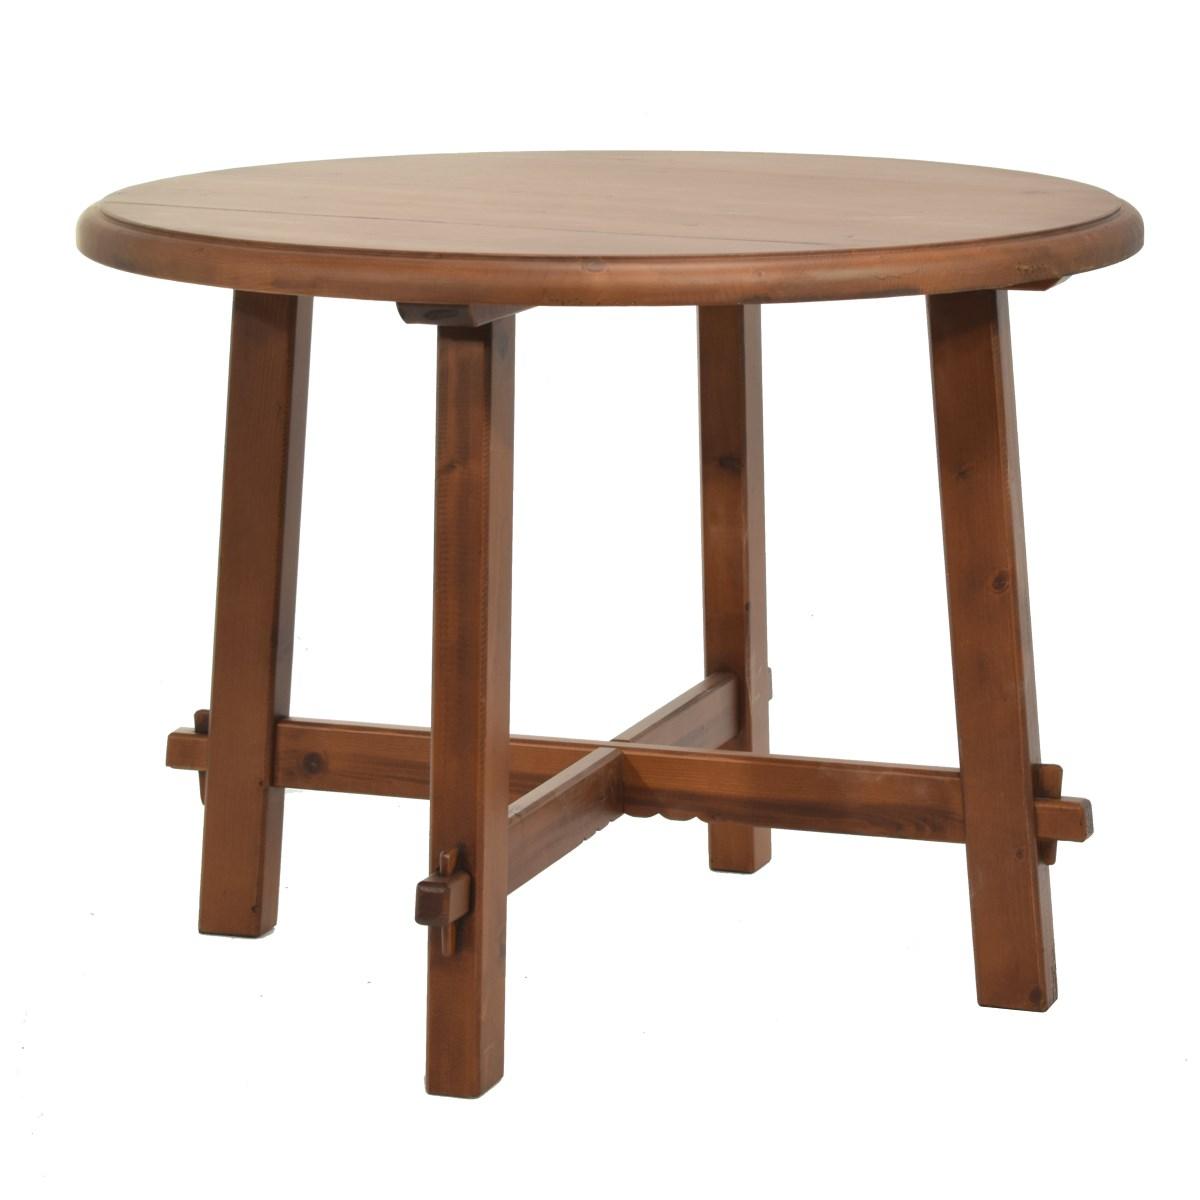 Mesa rústica redonda. Ecorústico: venta de muebles